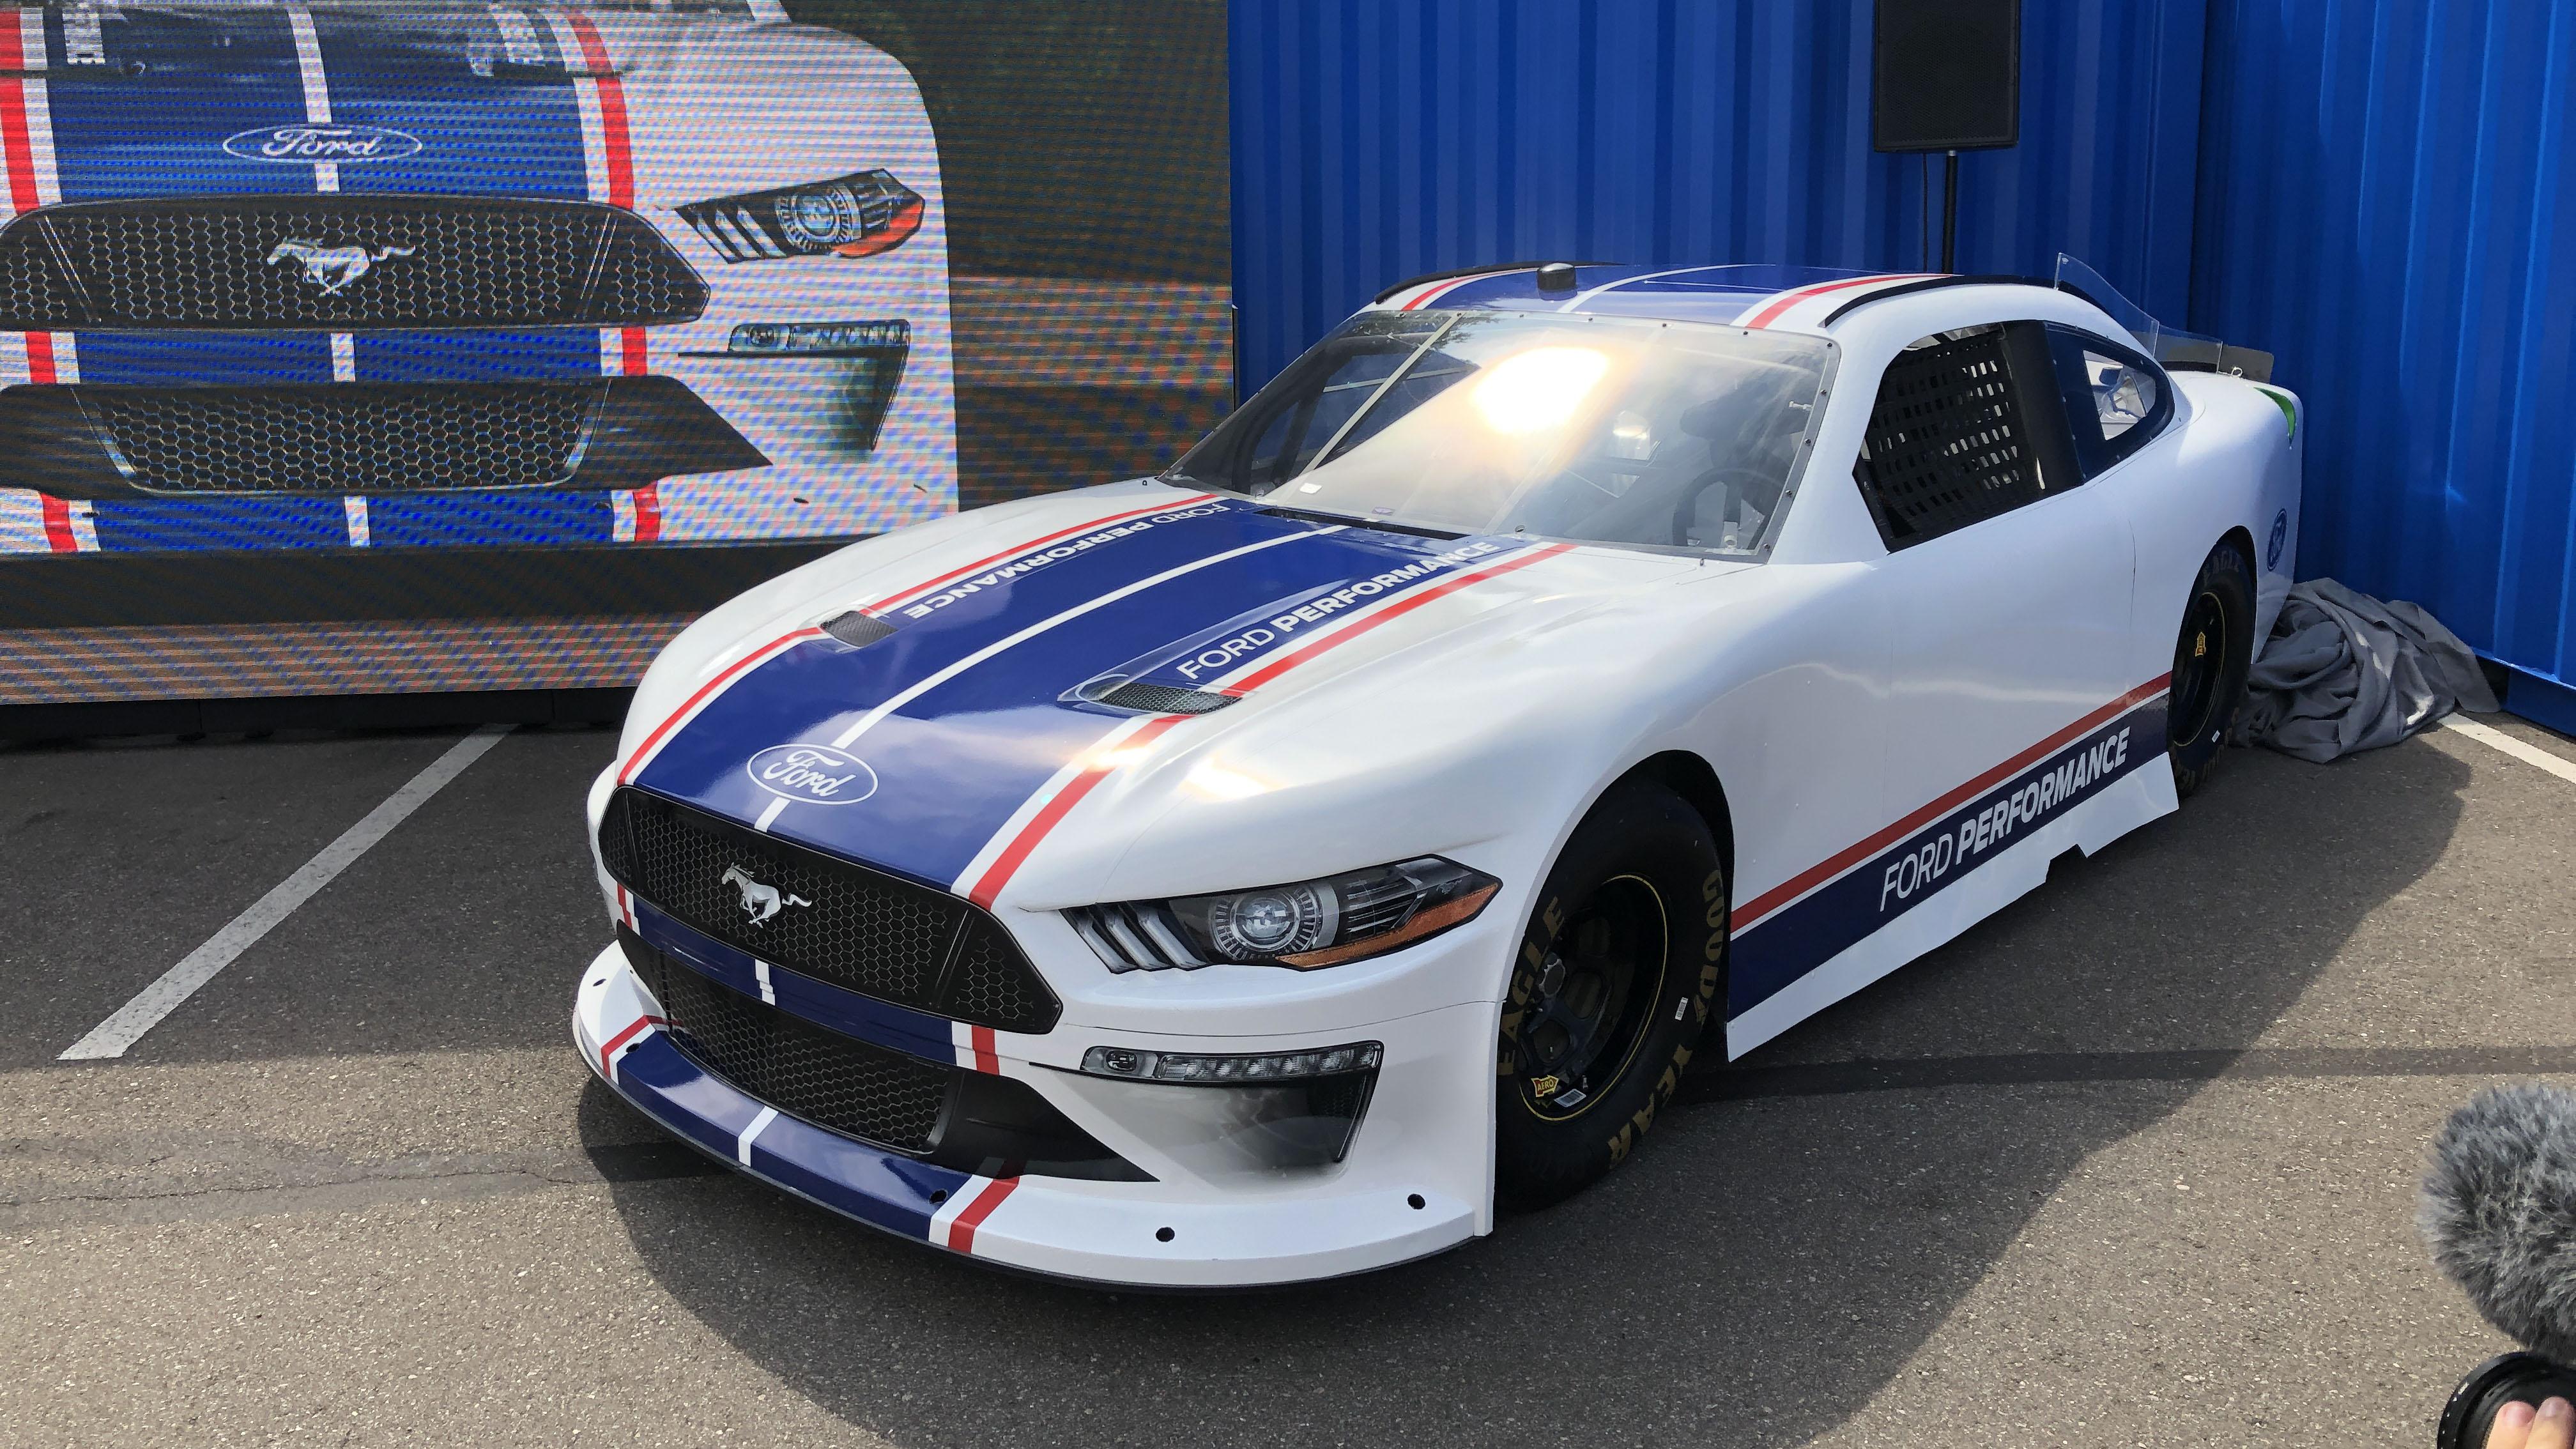 Nascar Ford Mustang 2020